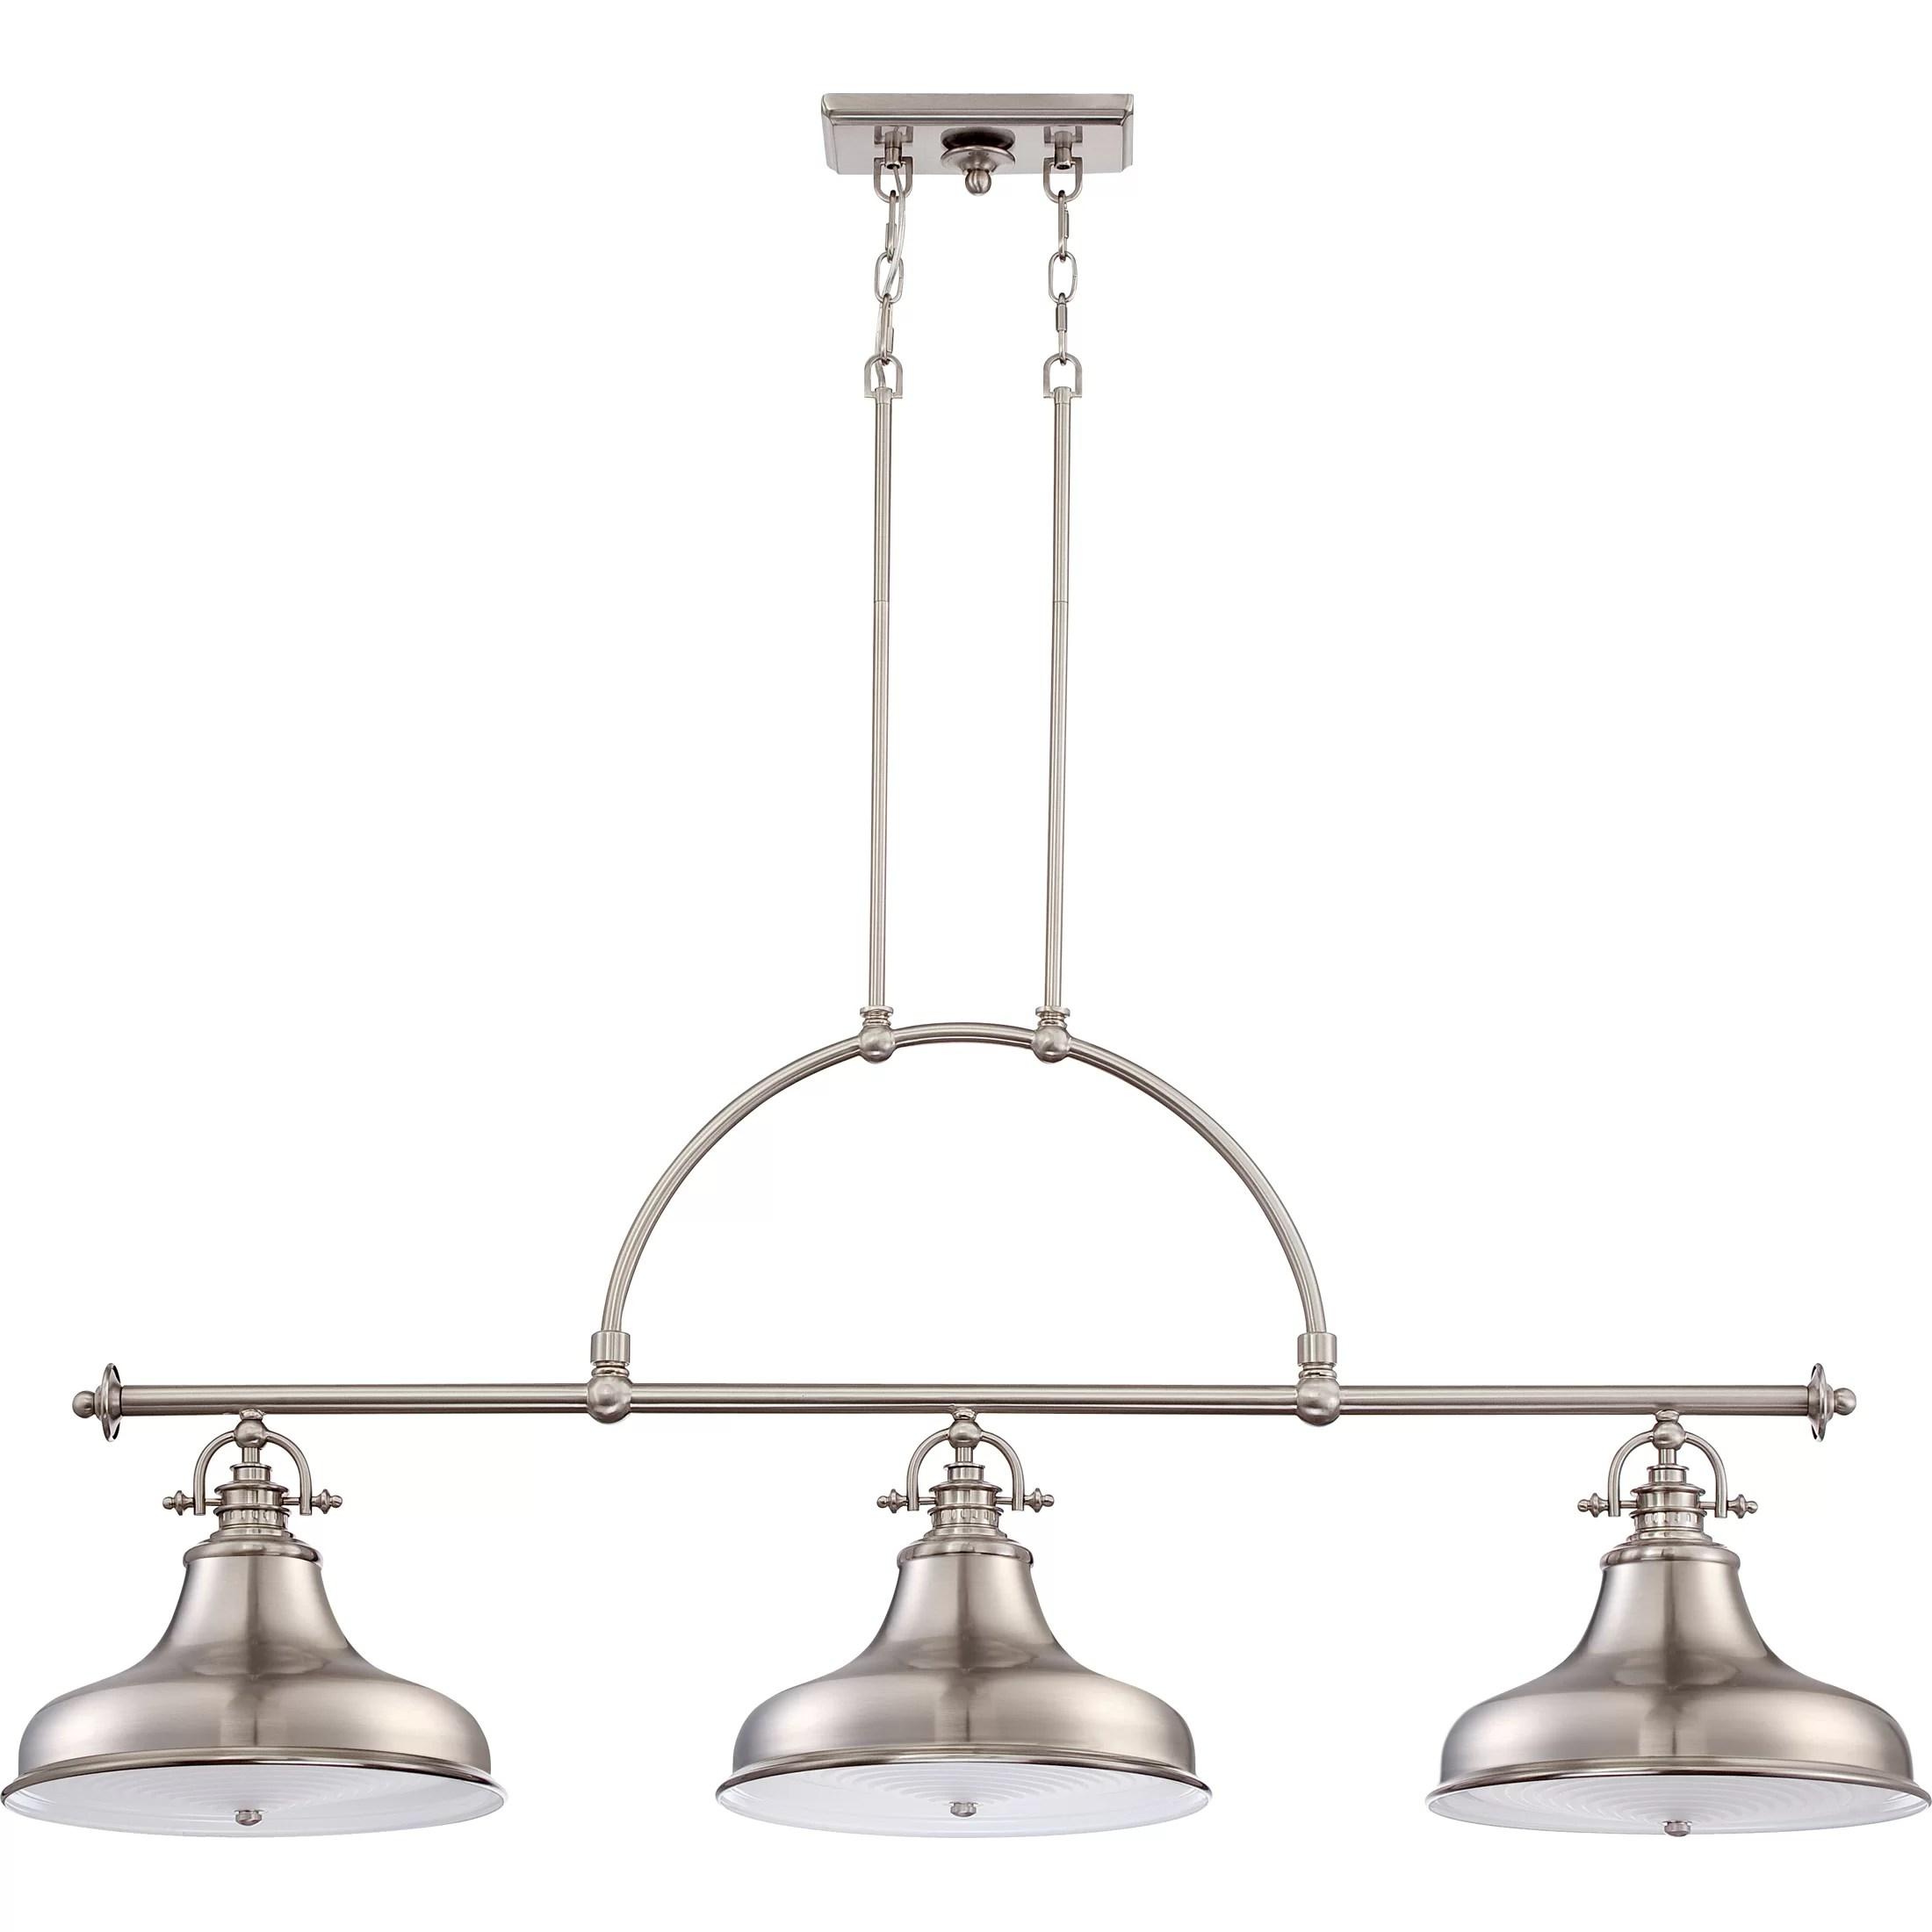 3 light kitchen island pendant 42 cabinets trent austin design cetona